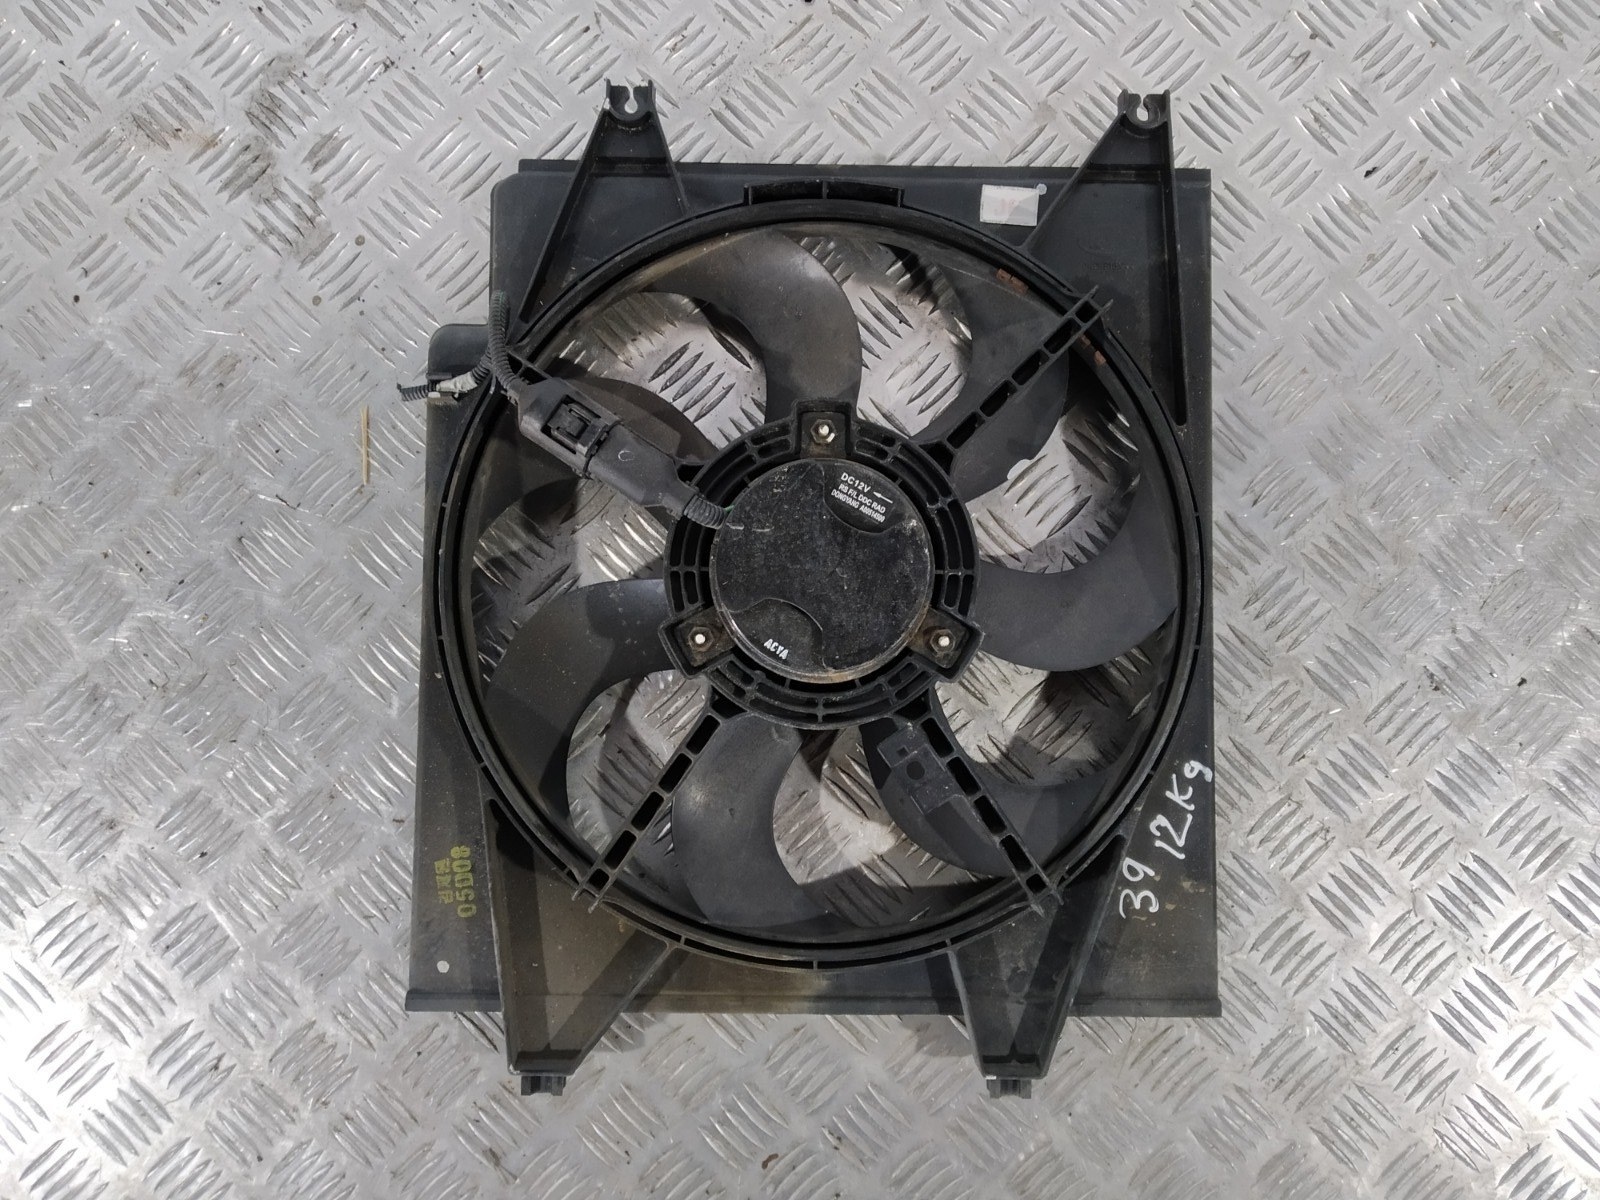 Вентилятор радиатора Kia Carens 2.0 CRDI 2005 (б/у)